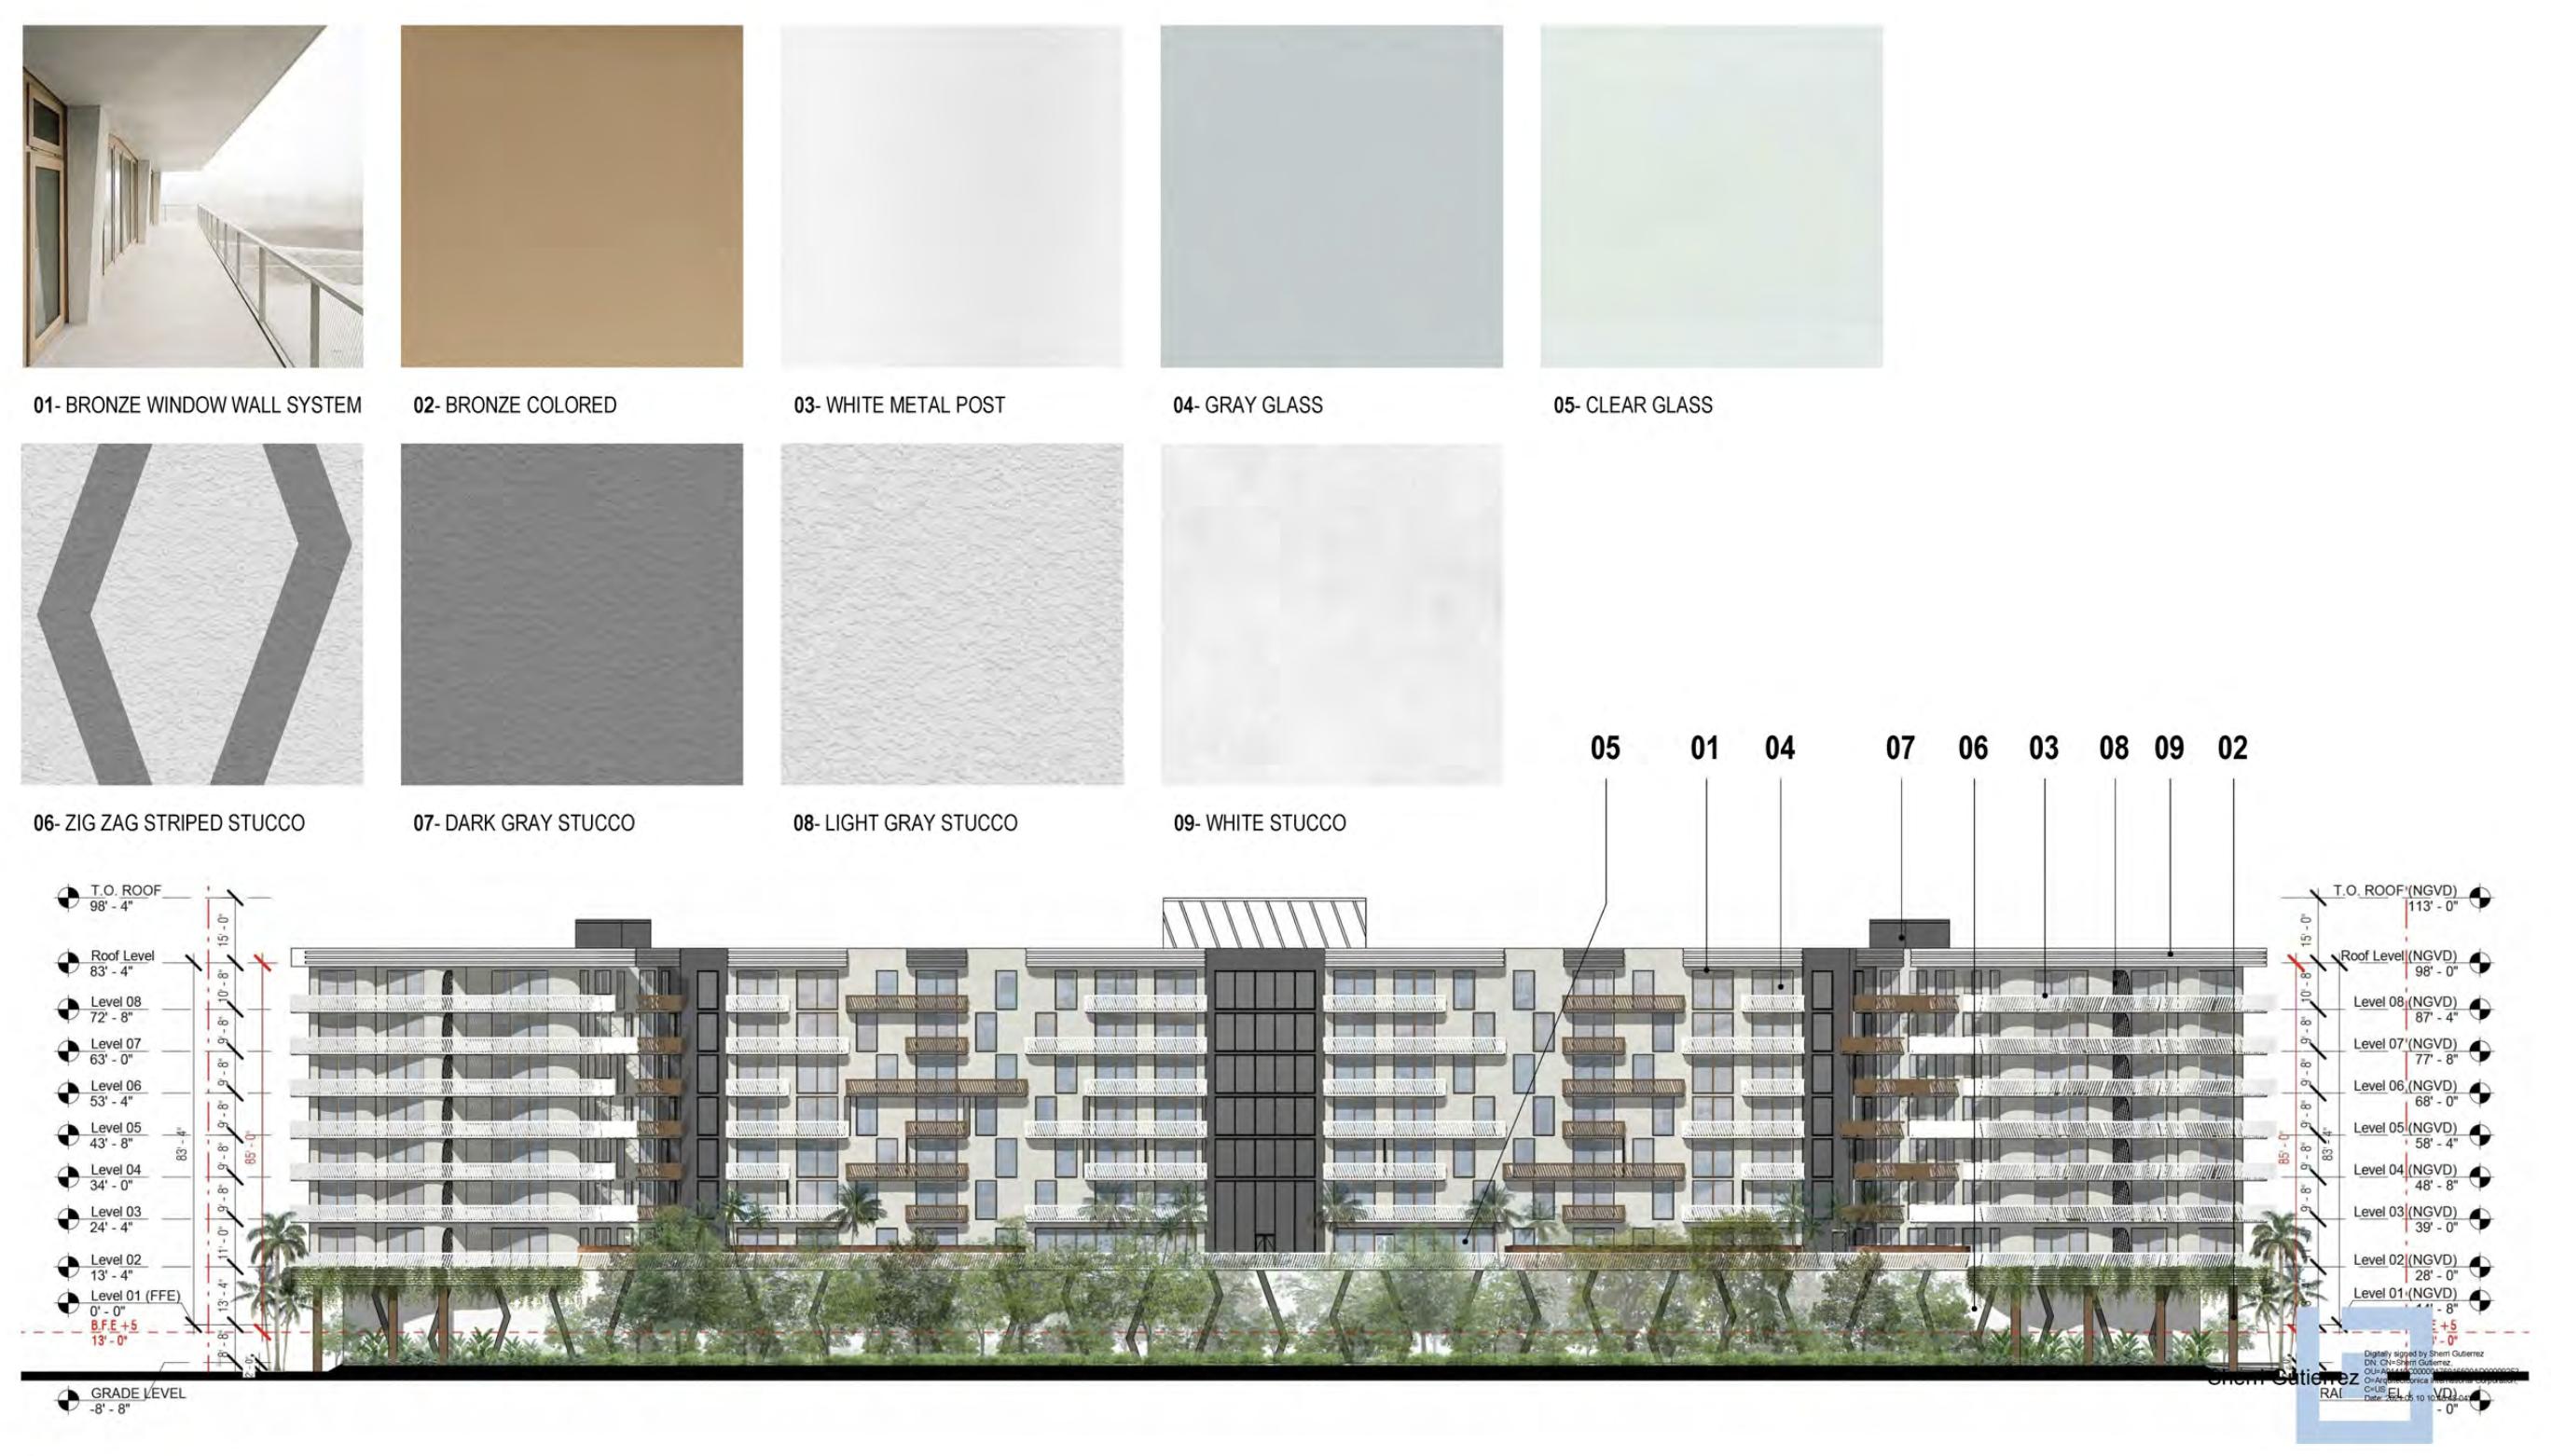 3900 Alton Road. Designed by Arquitectonica.